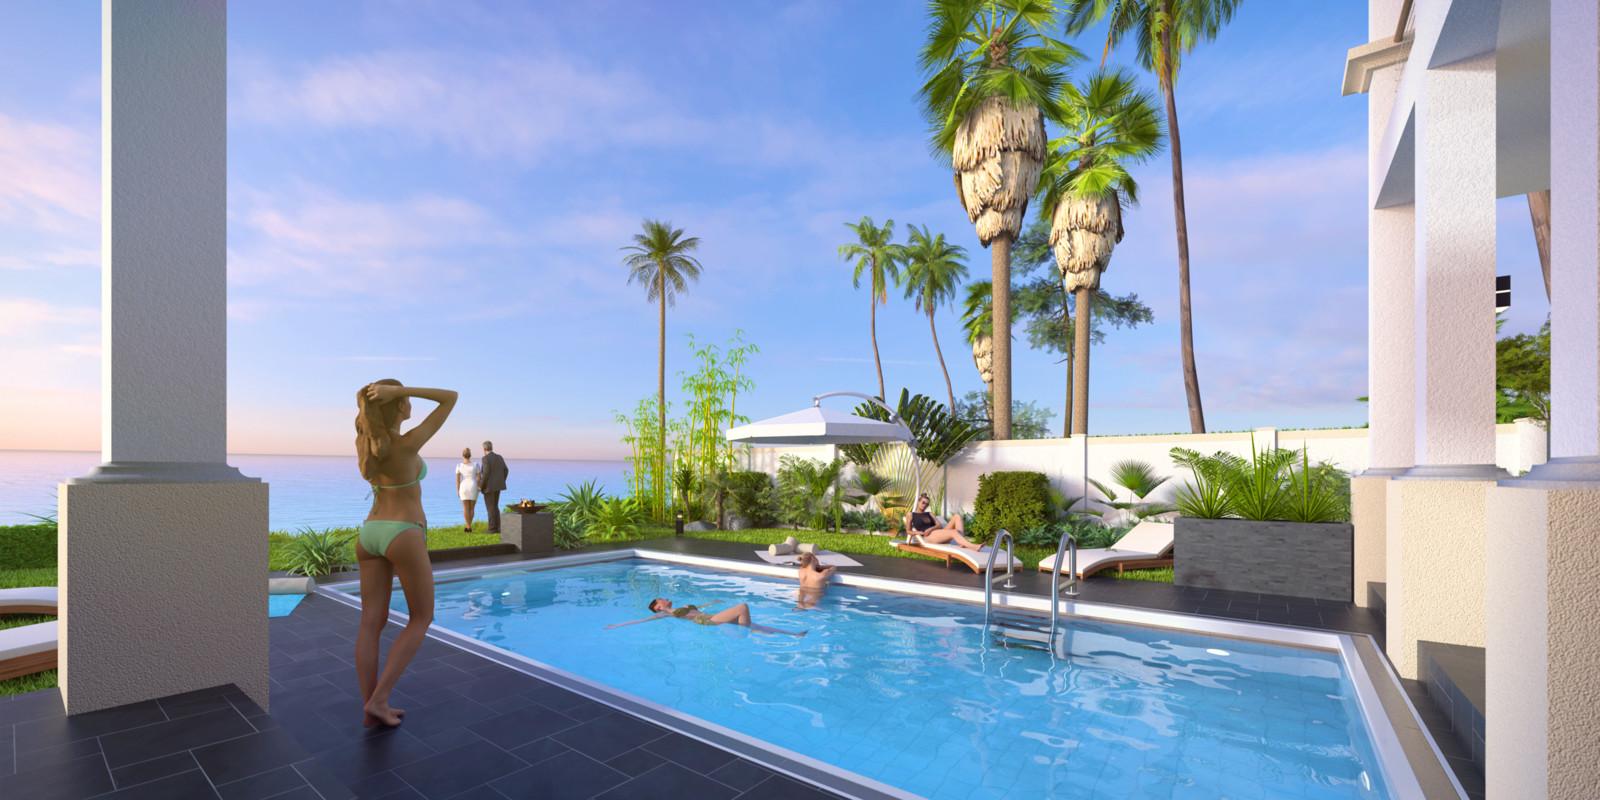 SketchUp + Thea Render  Seagrove Beach House: Poolside 6C B Lumina Early 2160 × 1080 Presto MC Bucket